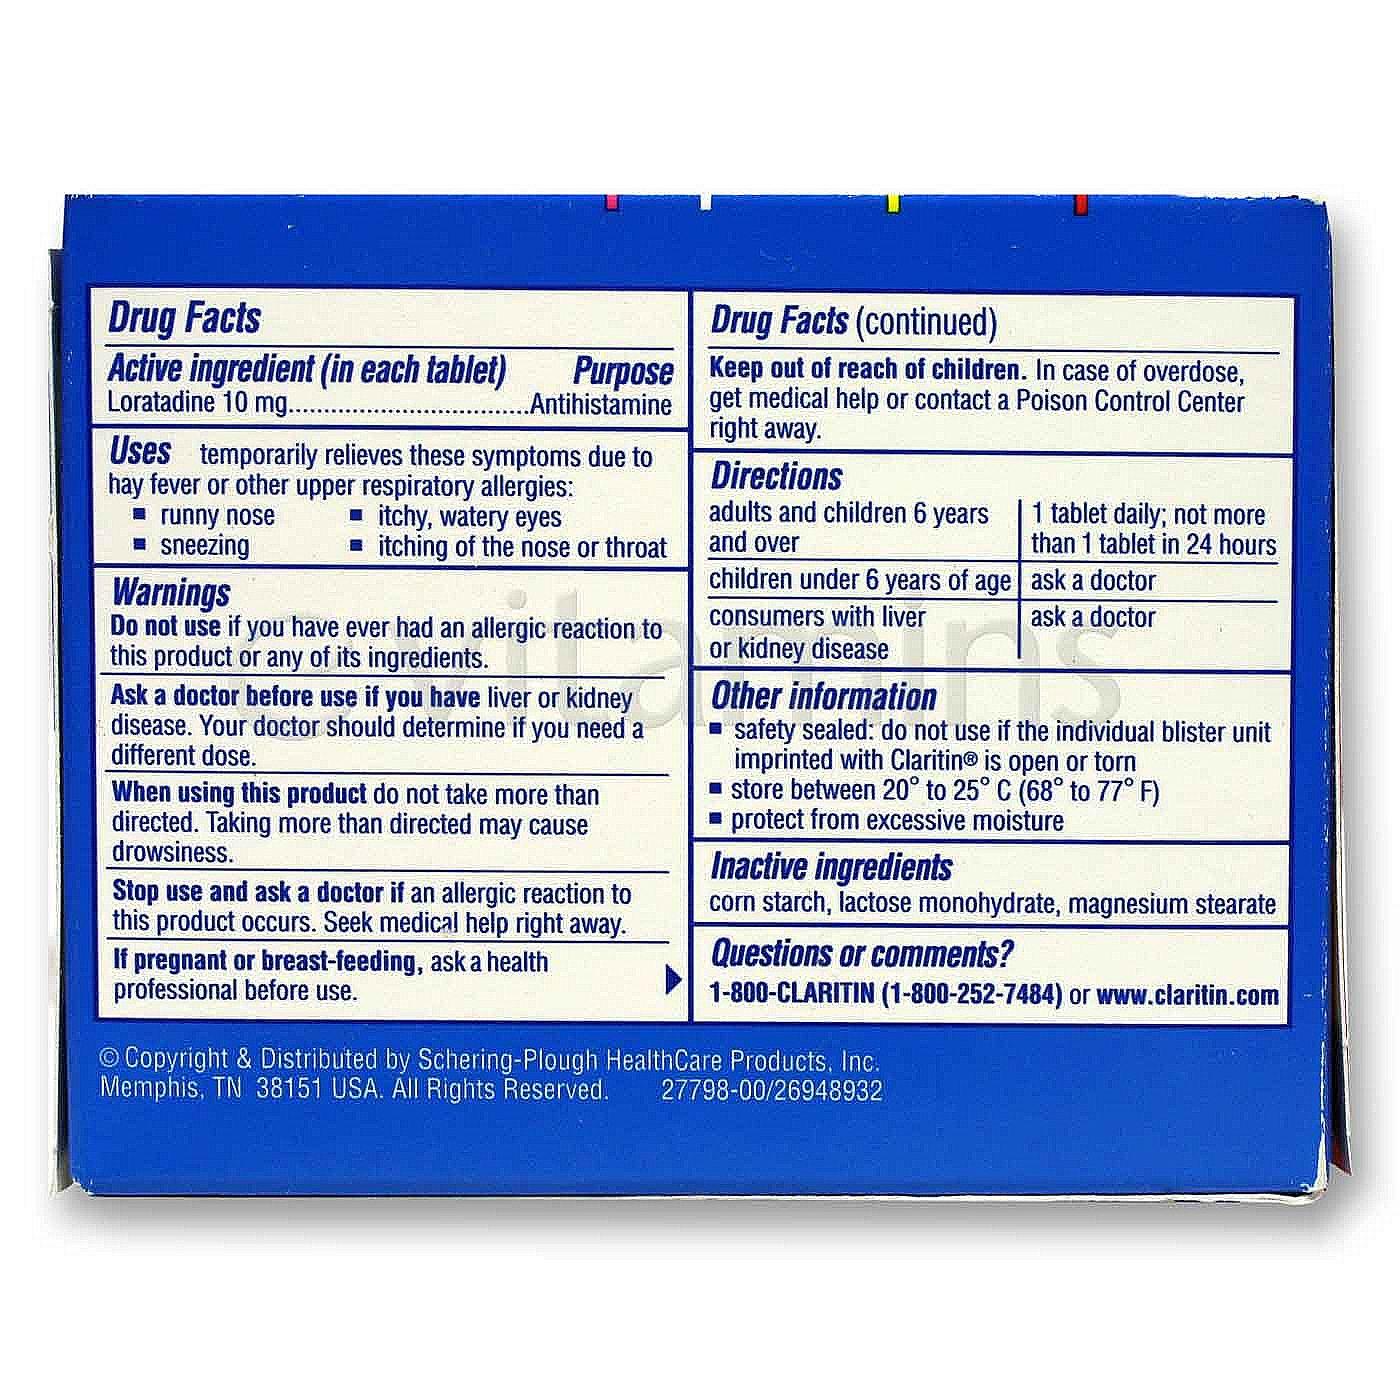 Ivermectin for head lice